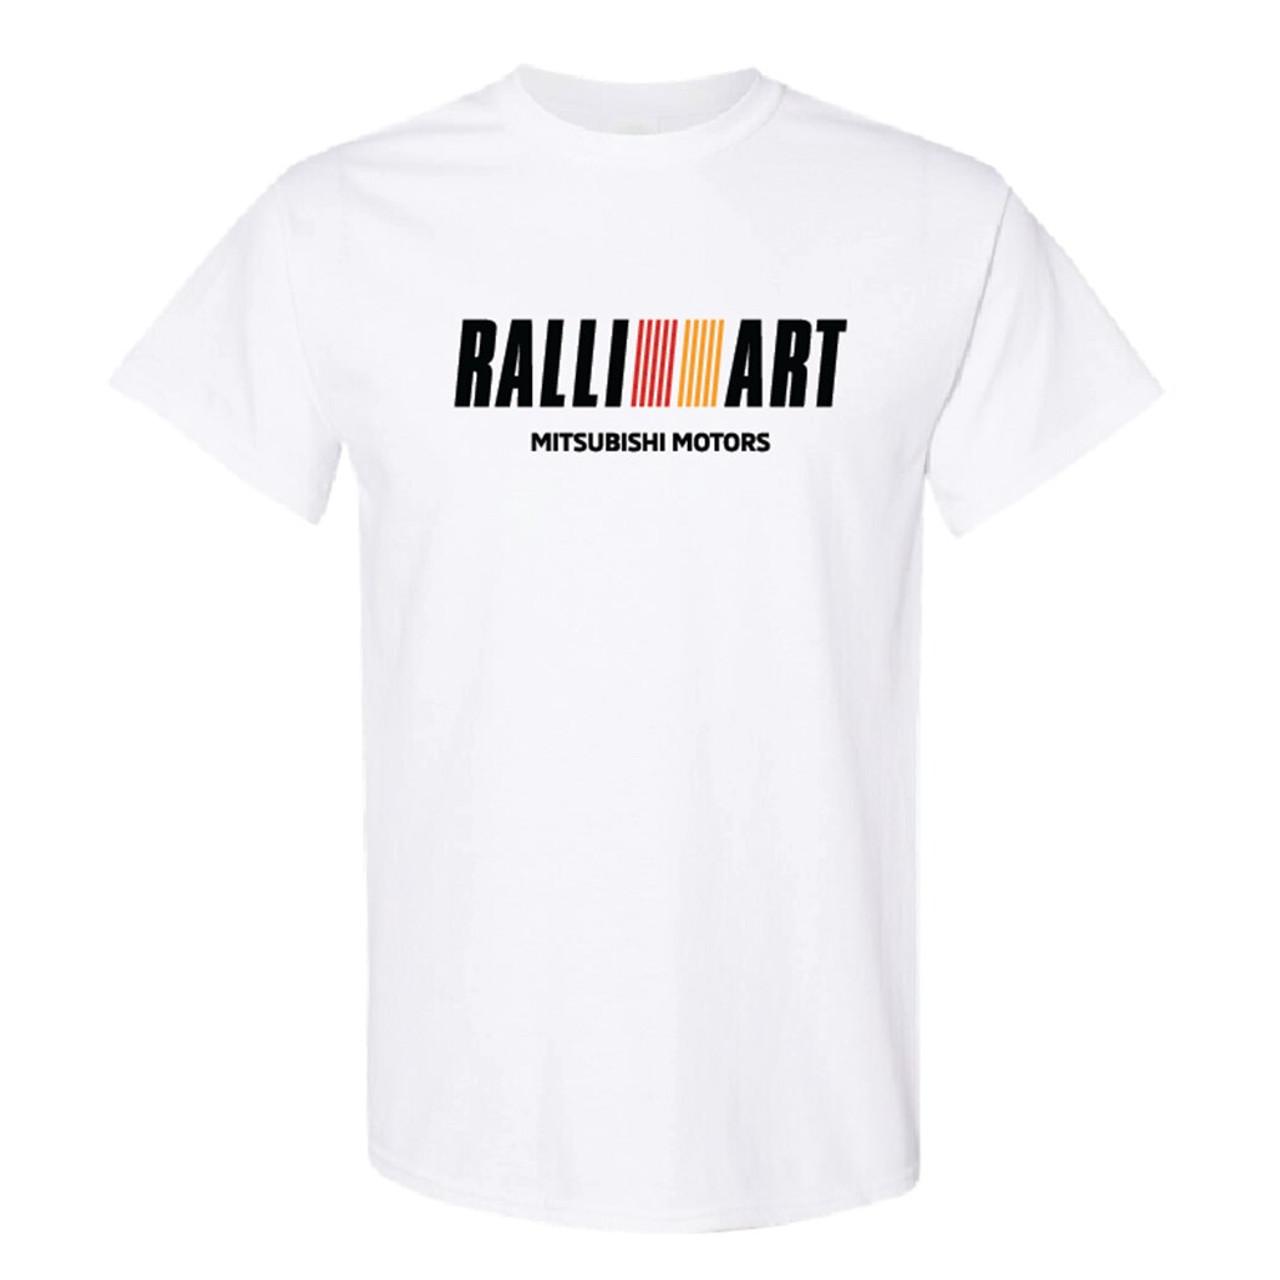 RALLIART T-Shirt